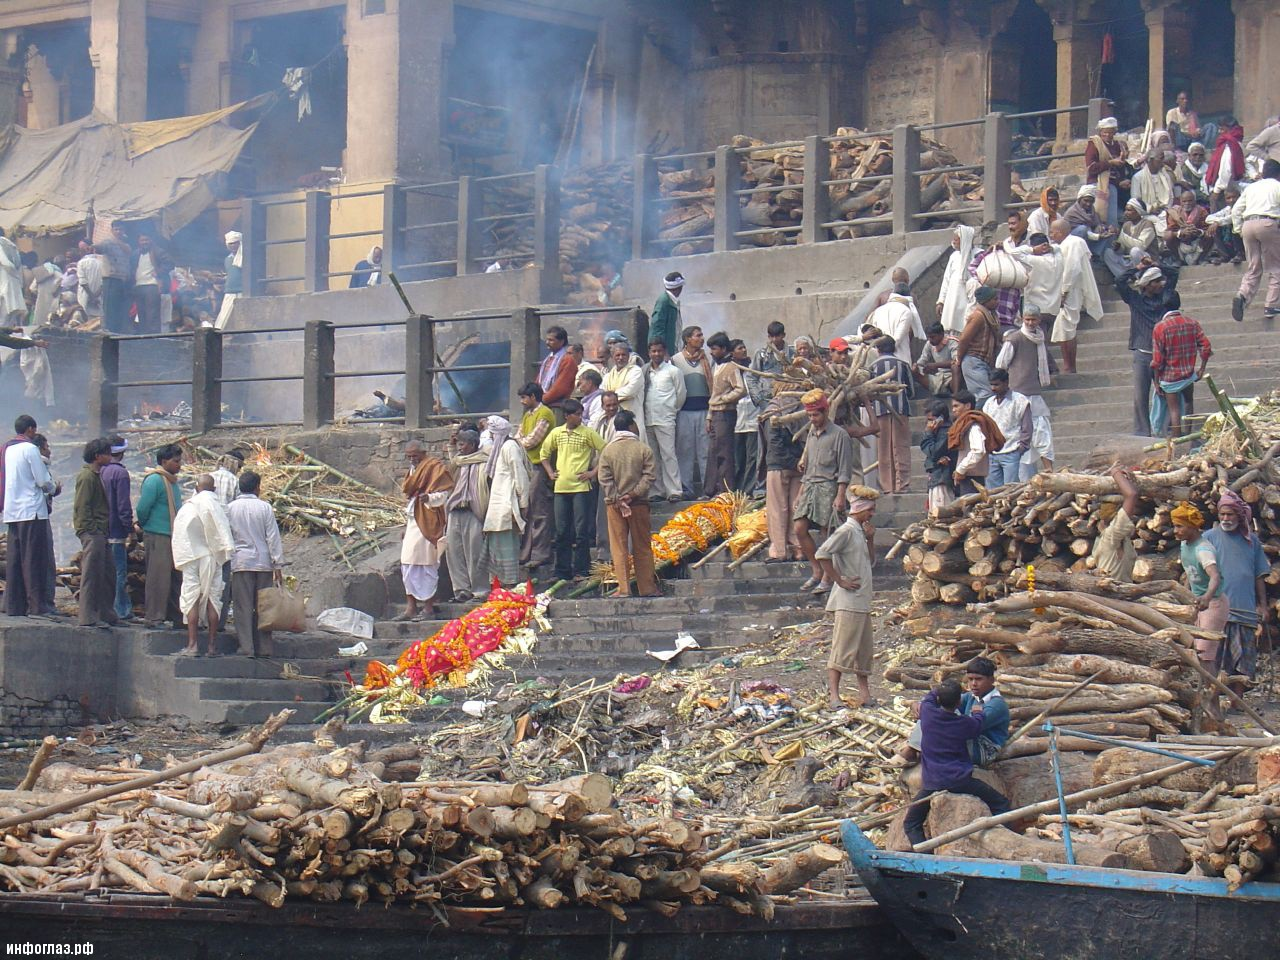 http://infoglaz.ru/wp-content/uploads/2013/03/india-cremation-gang.jpg